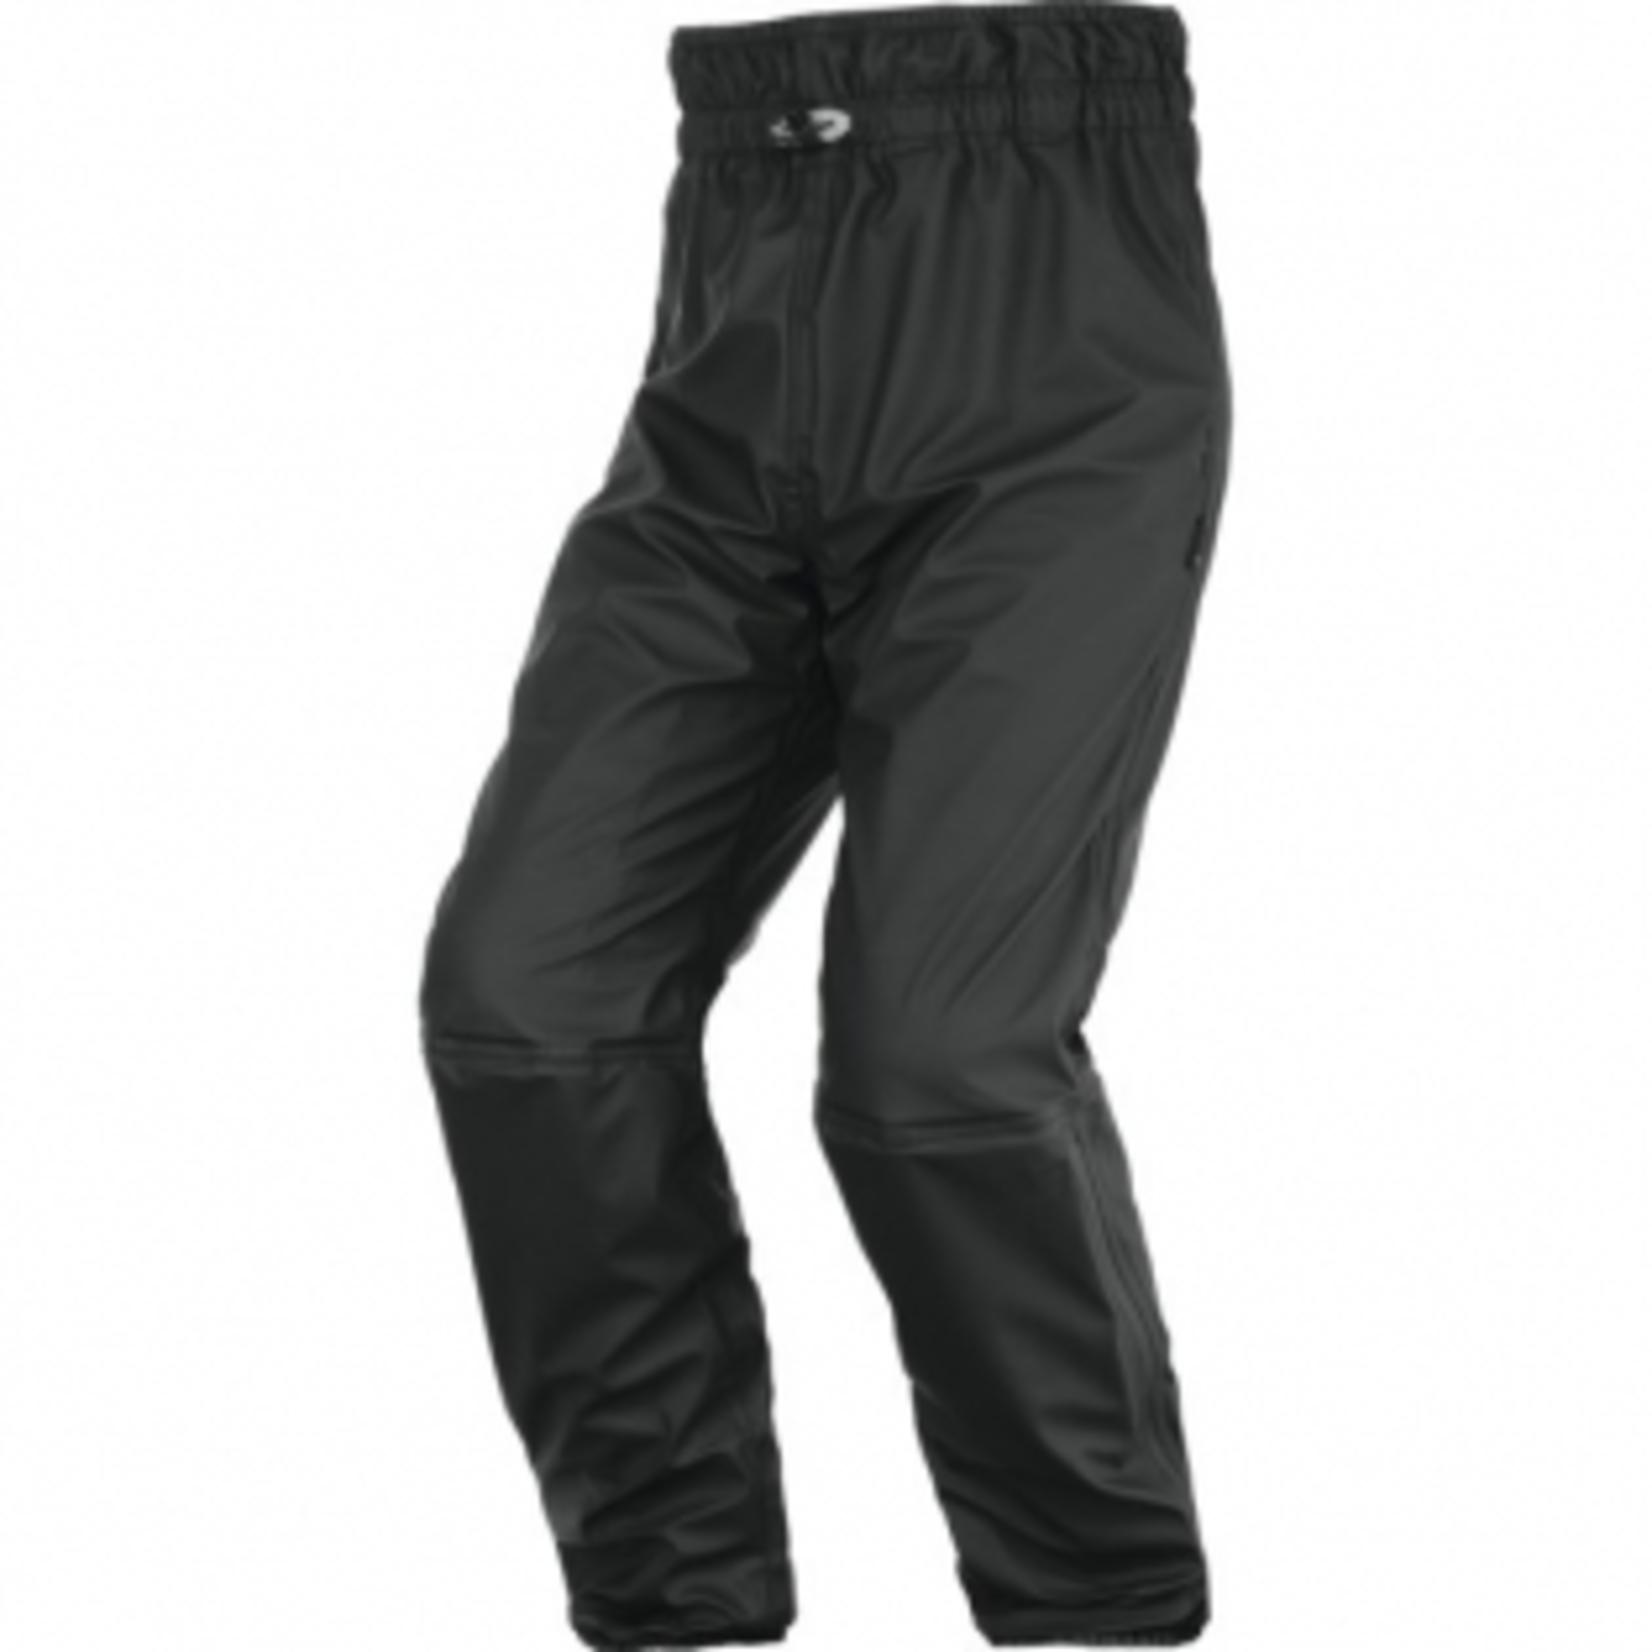 Apparel Rain Pants, SCOTT Black